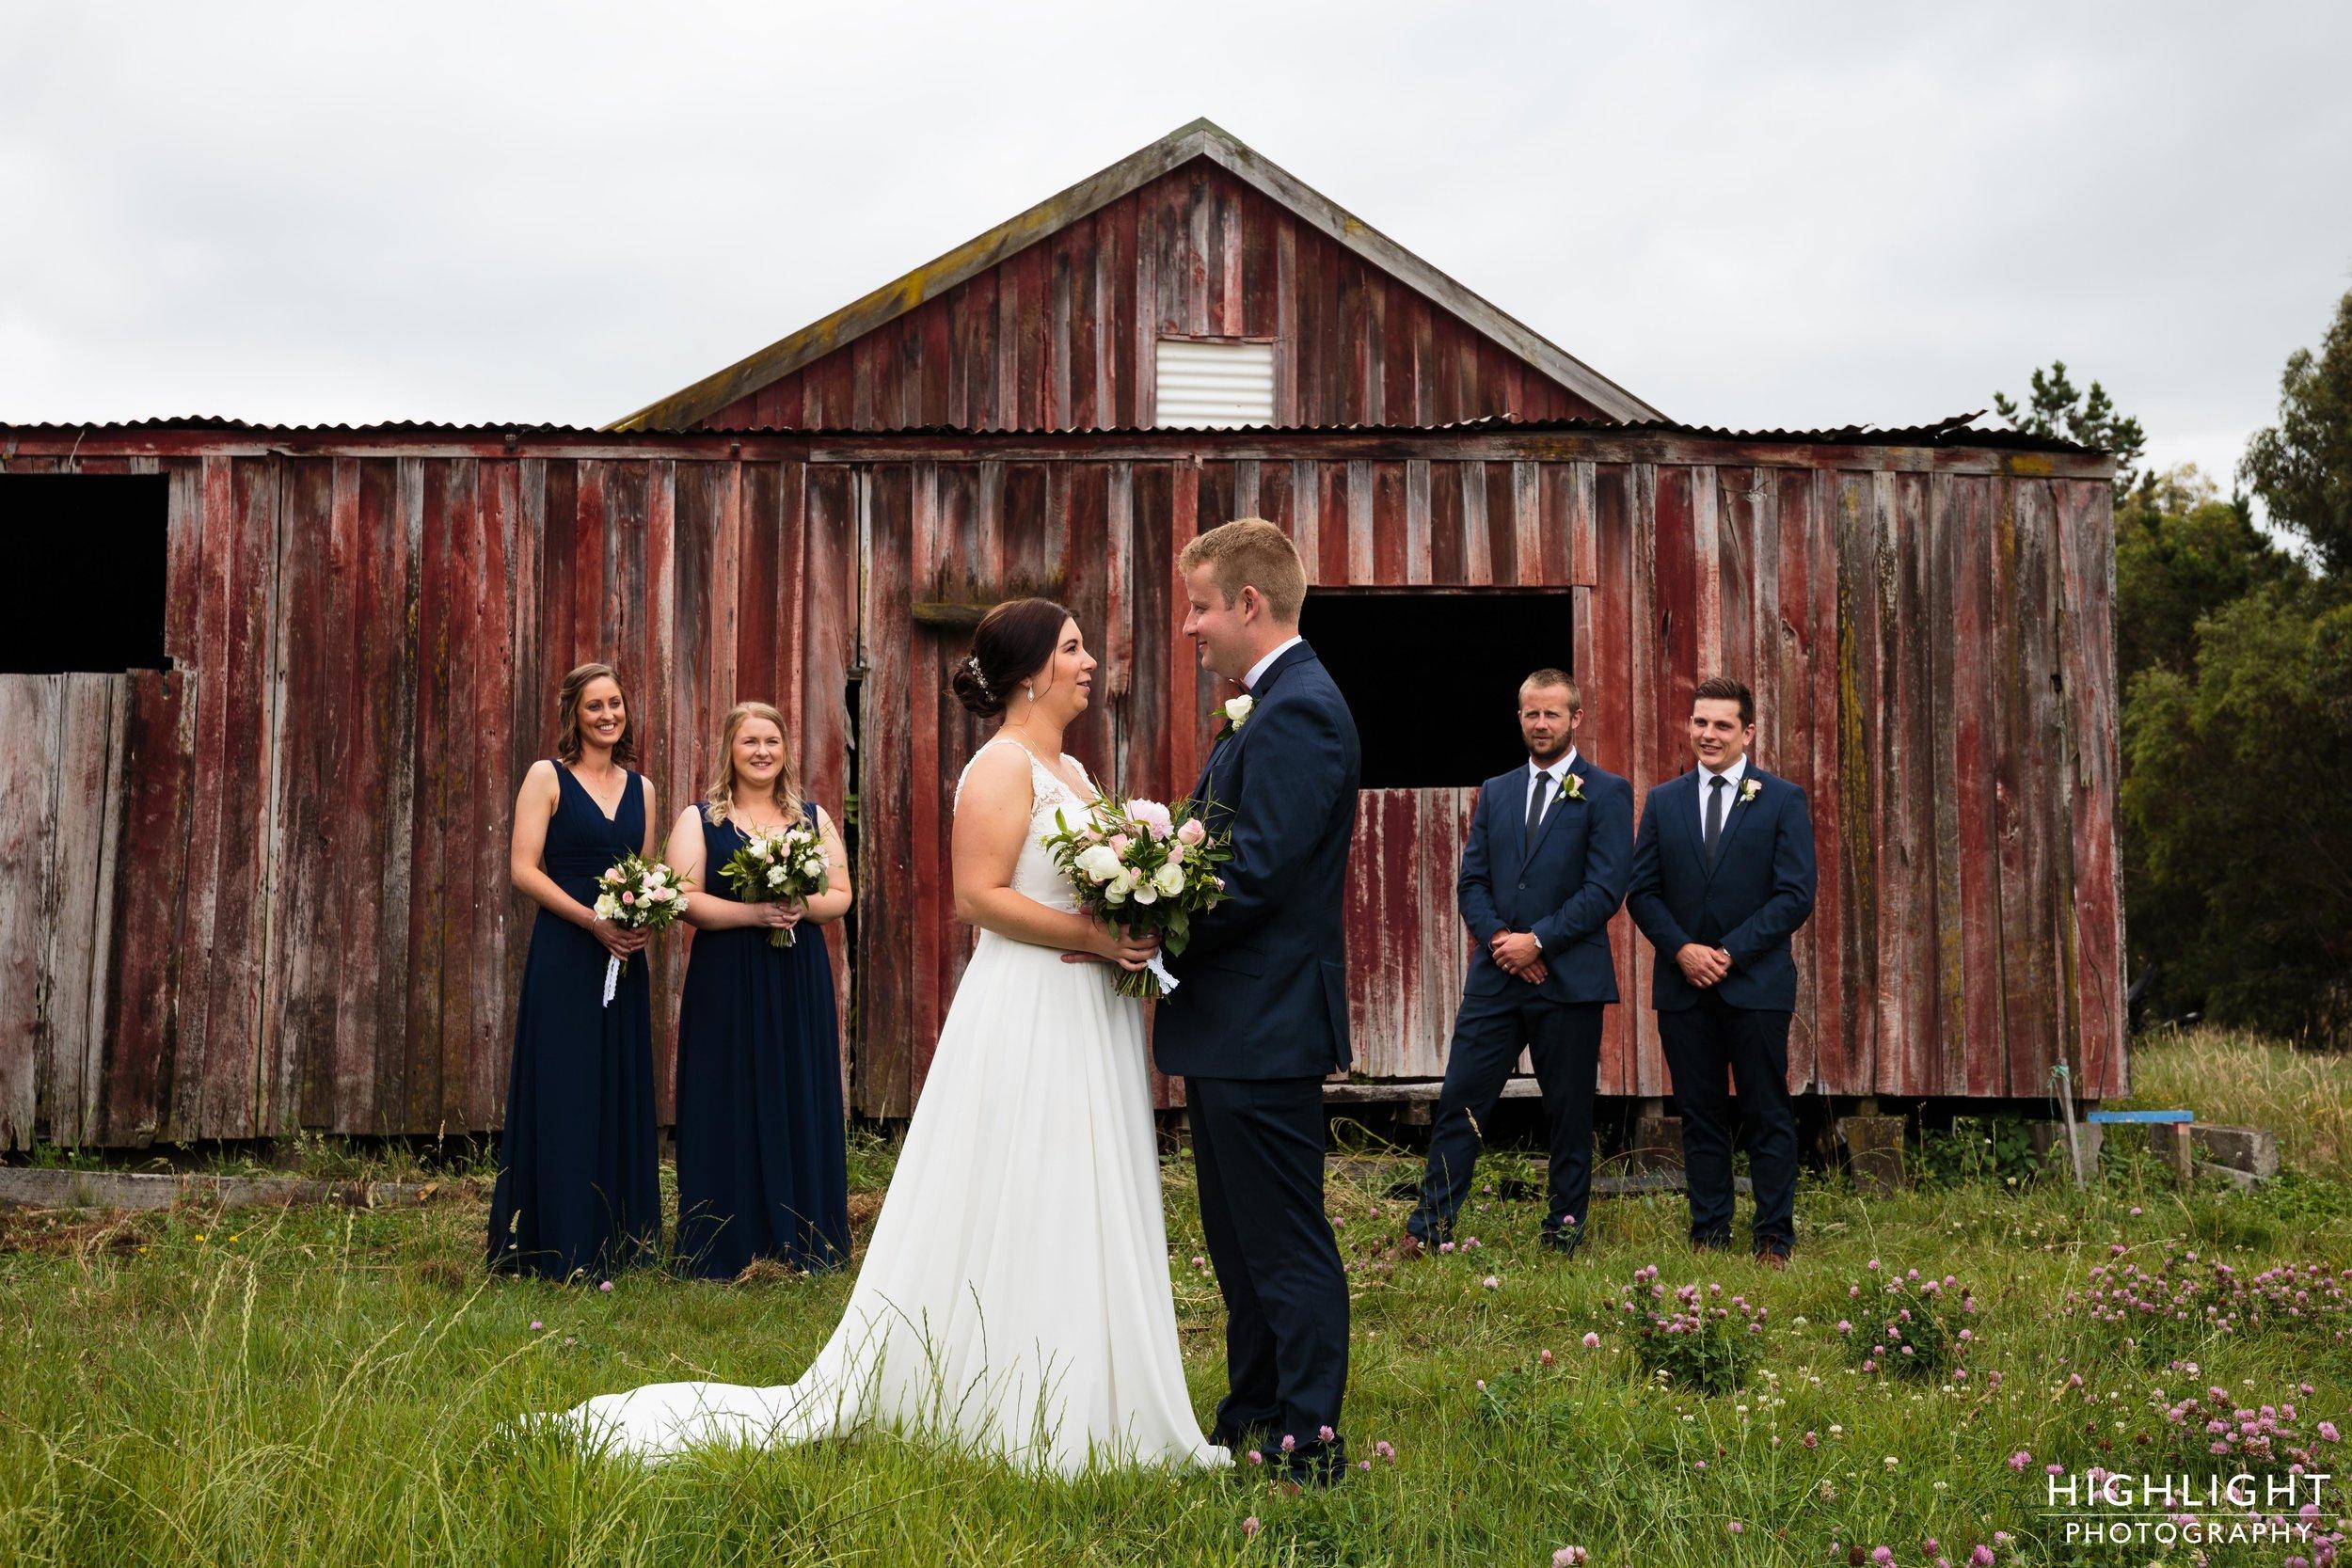 JM-2017-Highlight-wedding-photography-palmerston-north-new-zealand-114.jpg